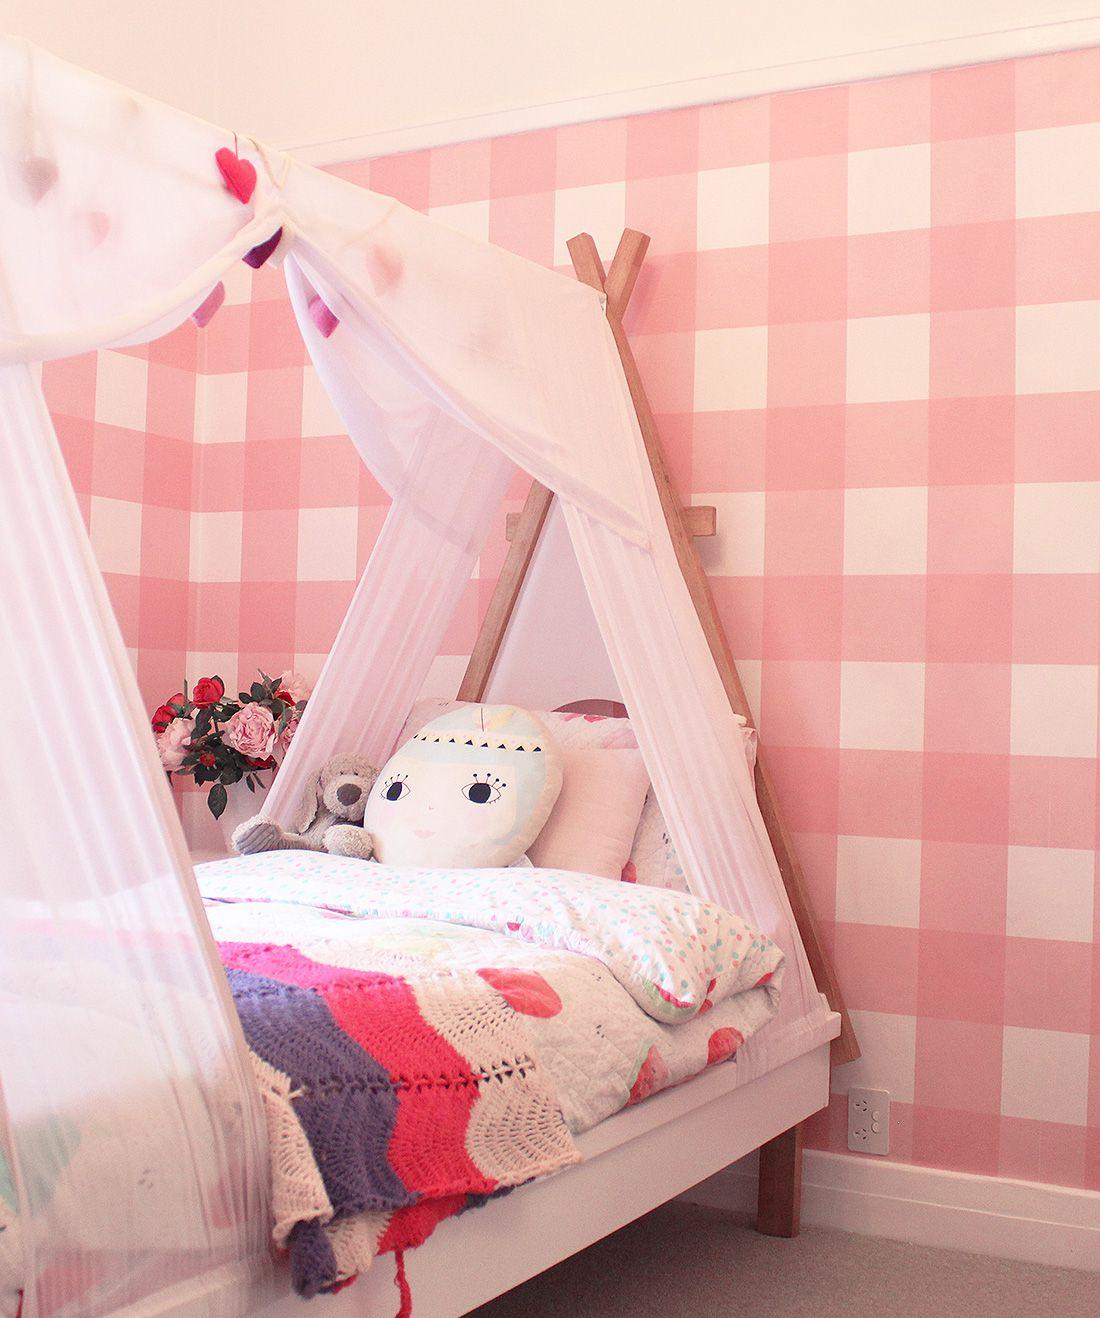 Buffalo Check Wallpaper • Kids Bedroom • Pink Plaid Wallpaper